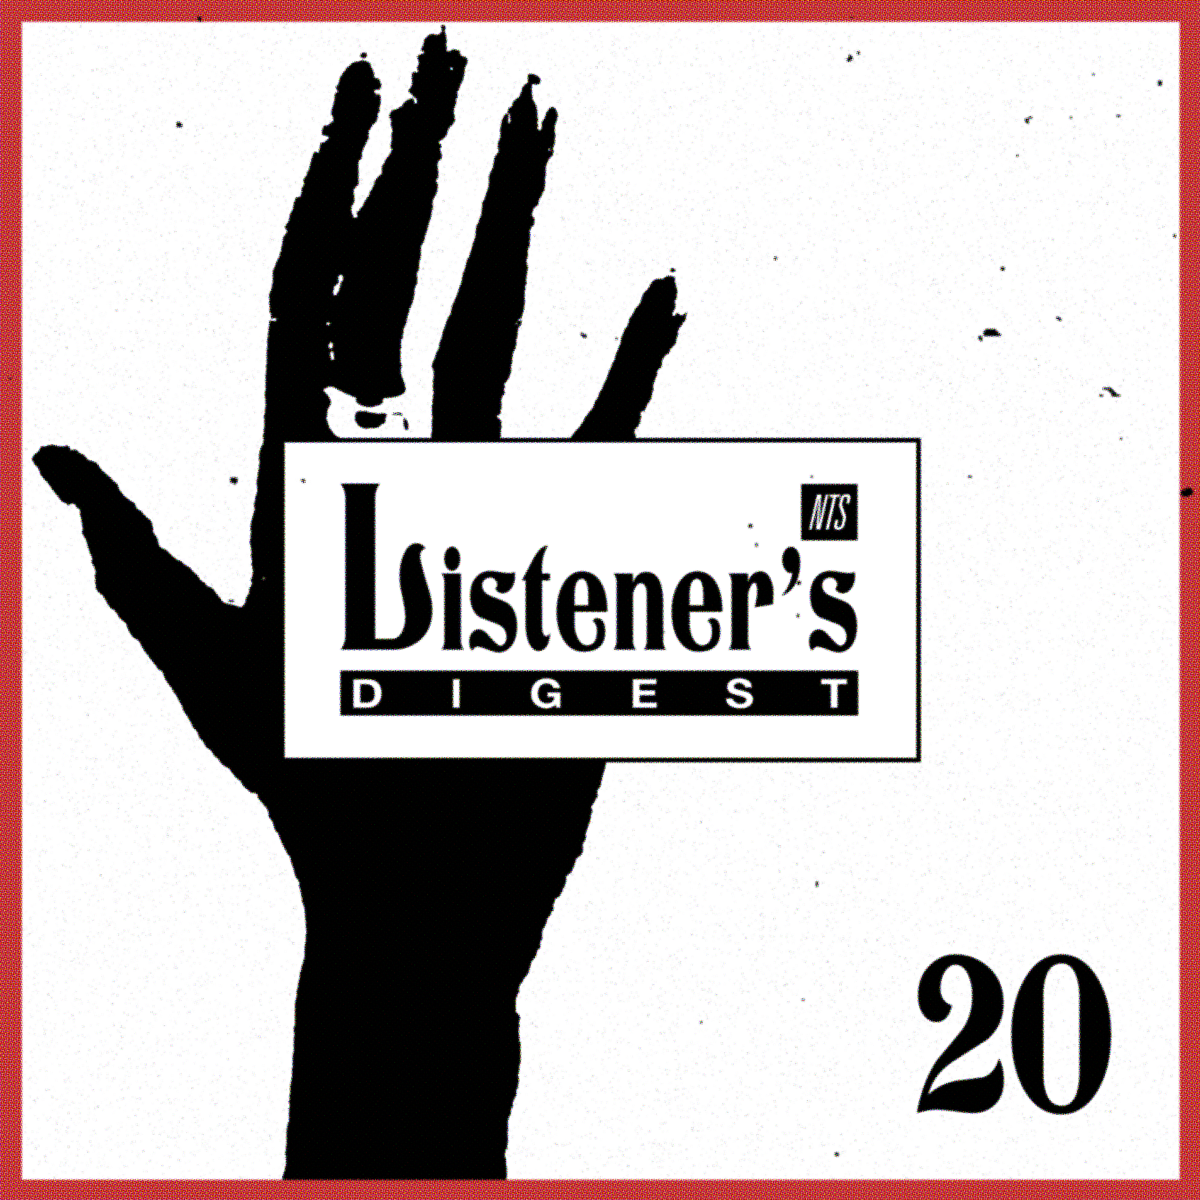 Listeners-Digest-20-NTS.png